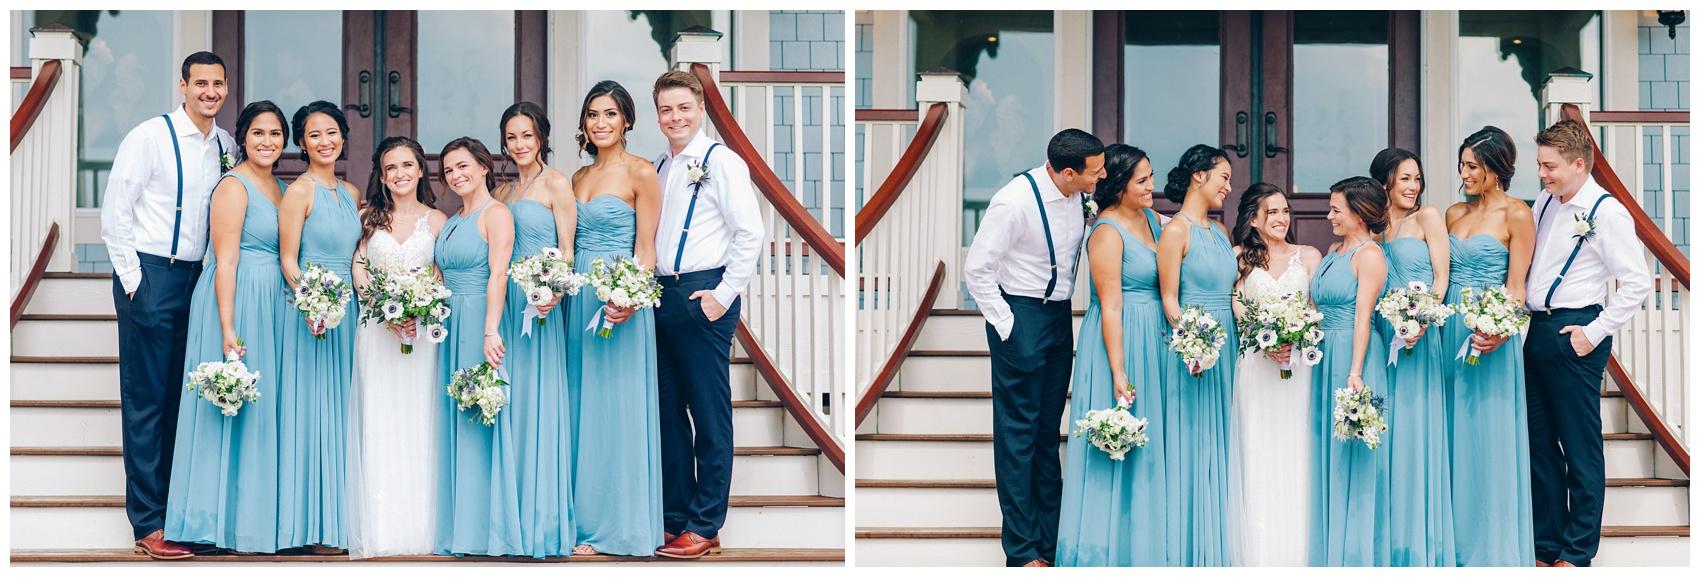 Outer-Banks-Corolla-Wedding_0047.jpg